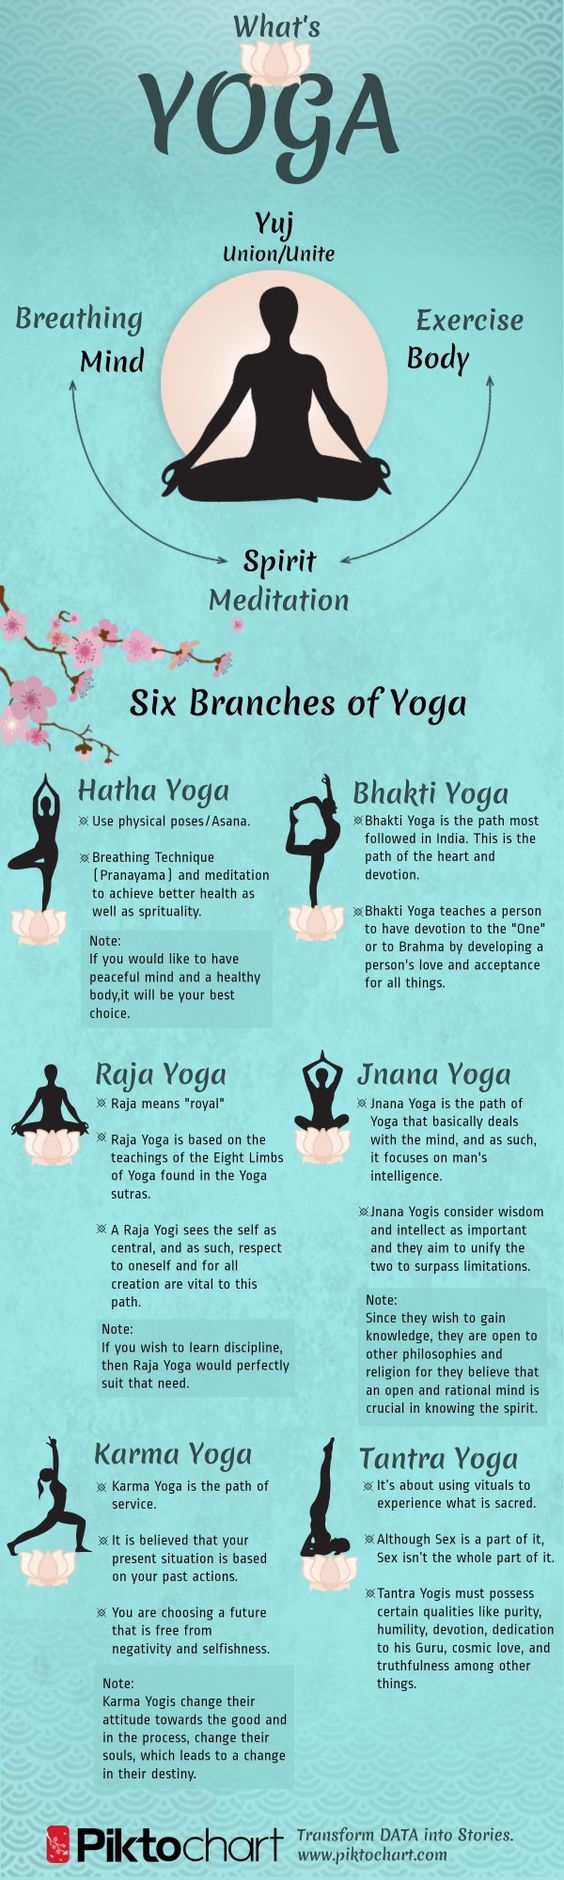 What's Yoga